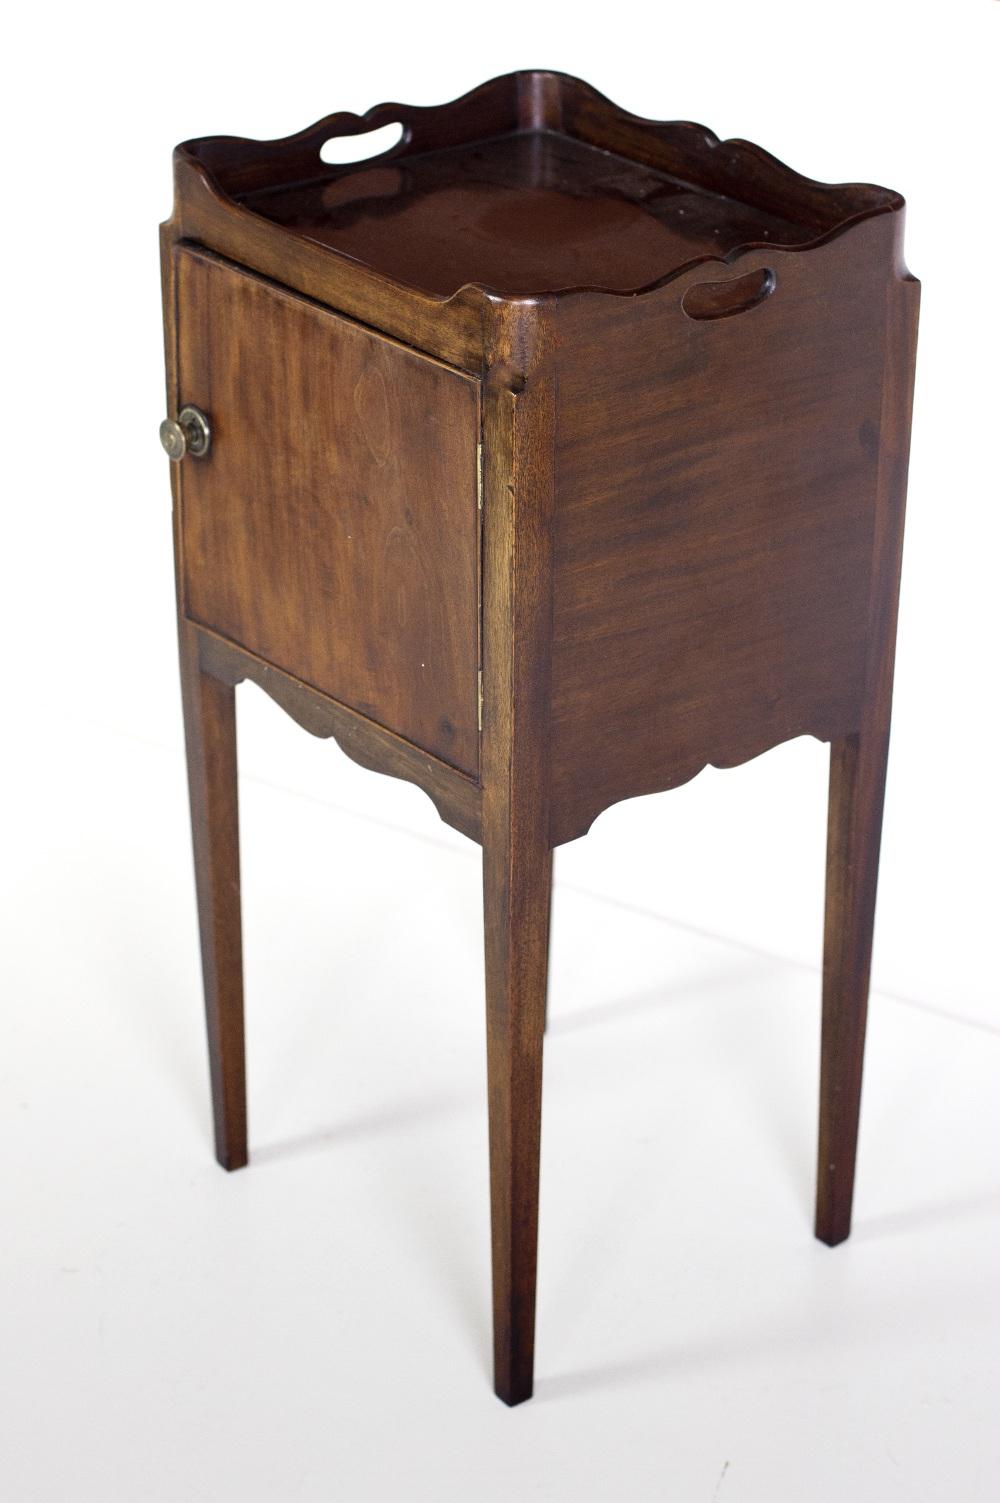 Lot 23 - A fine quality Georgian style mahogany tray top Bedside Locker,